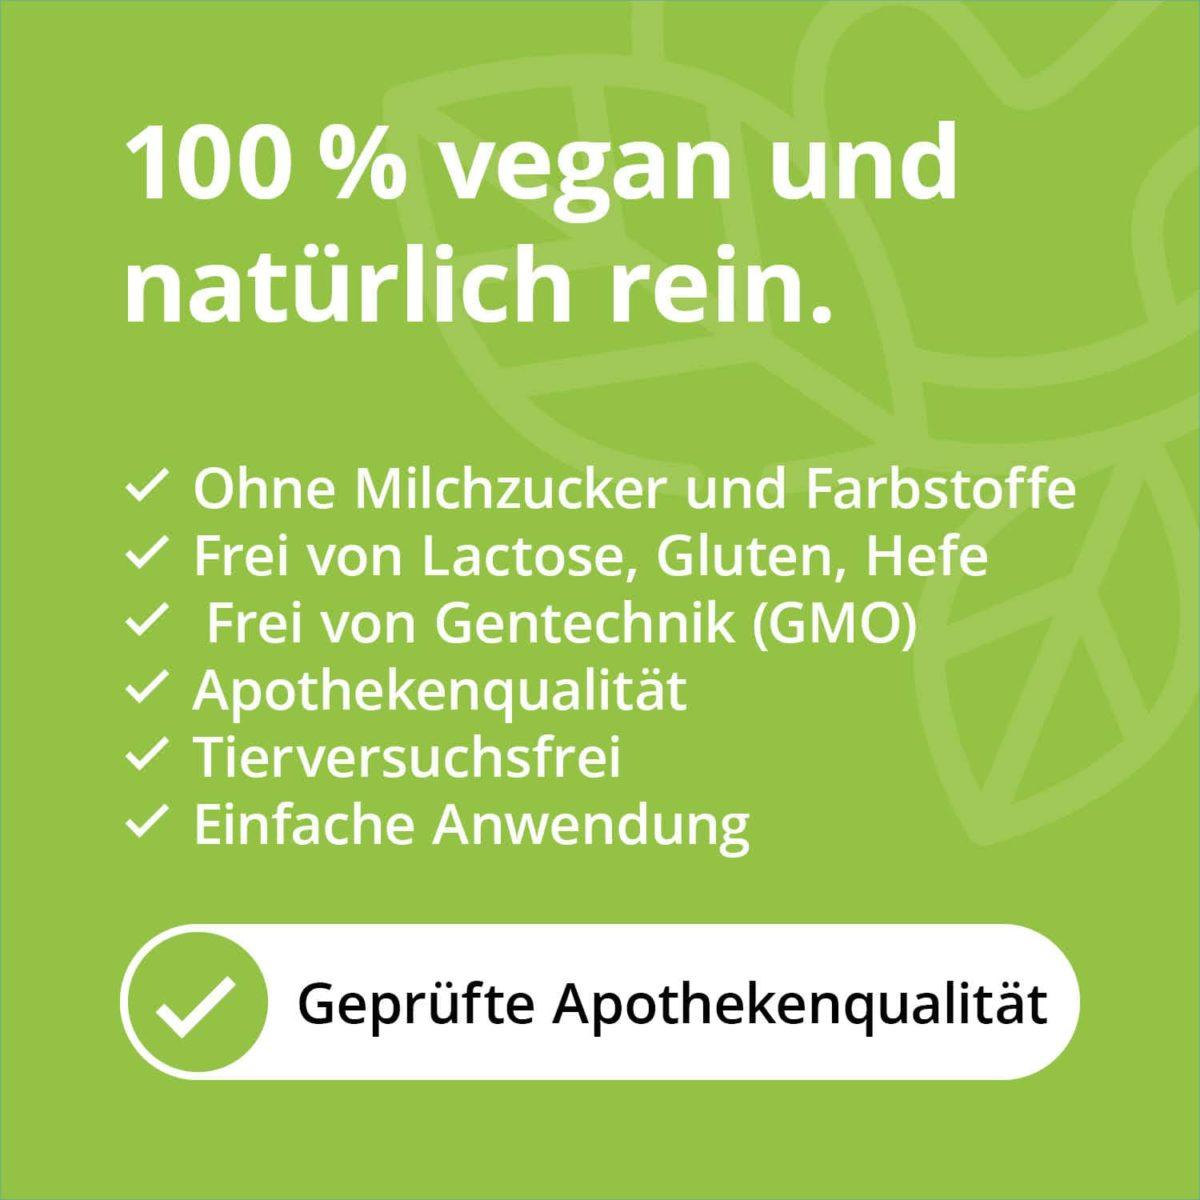 Casida DTX Bitter Kapseln 60 Stück PZN 17175086 Apotheke Flohsamen, Grüner Tee Extrakt, Leinsamen, Löwenzahnwurzel Darm Leber Galle5